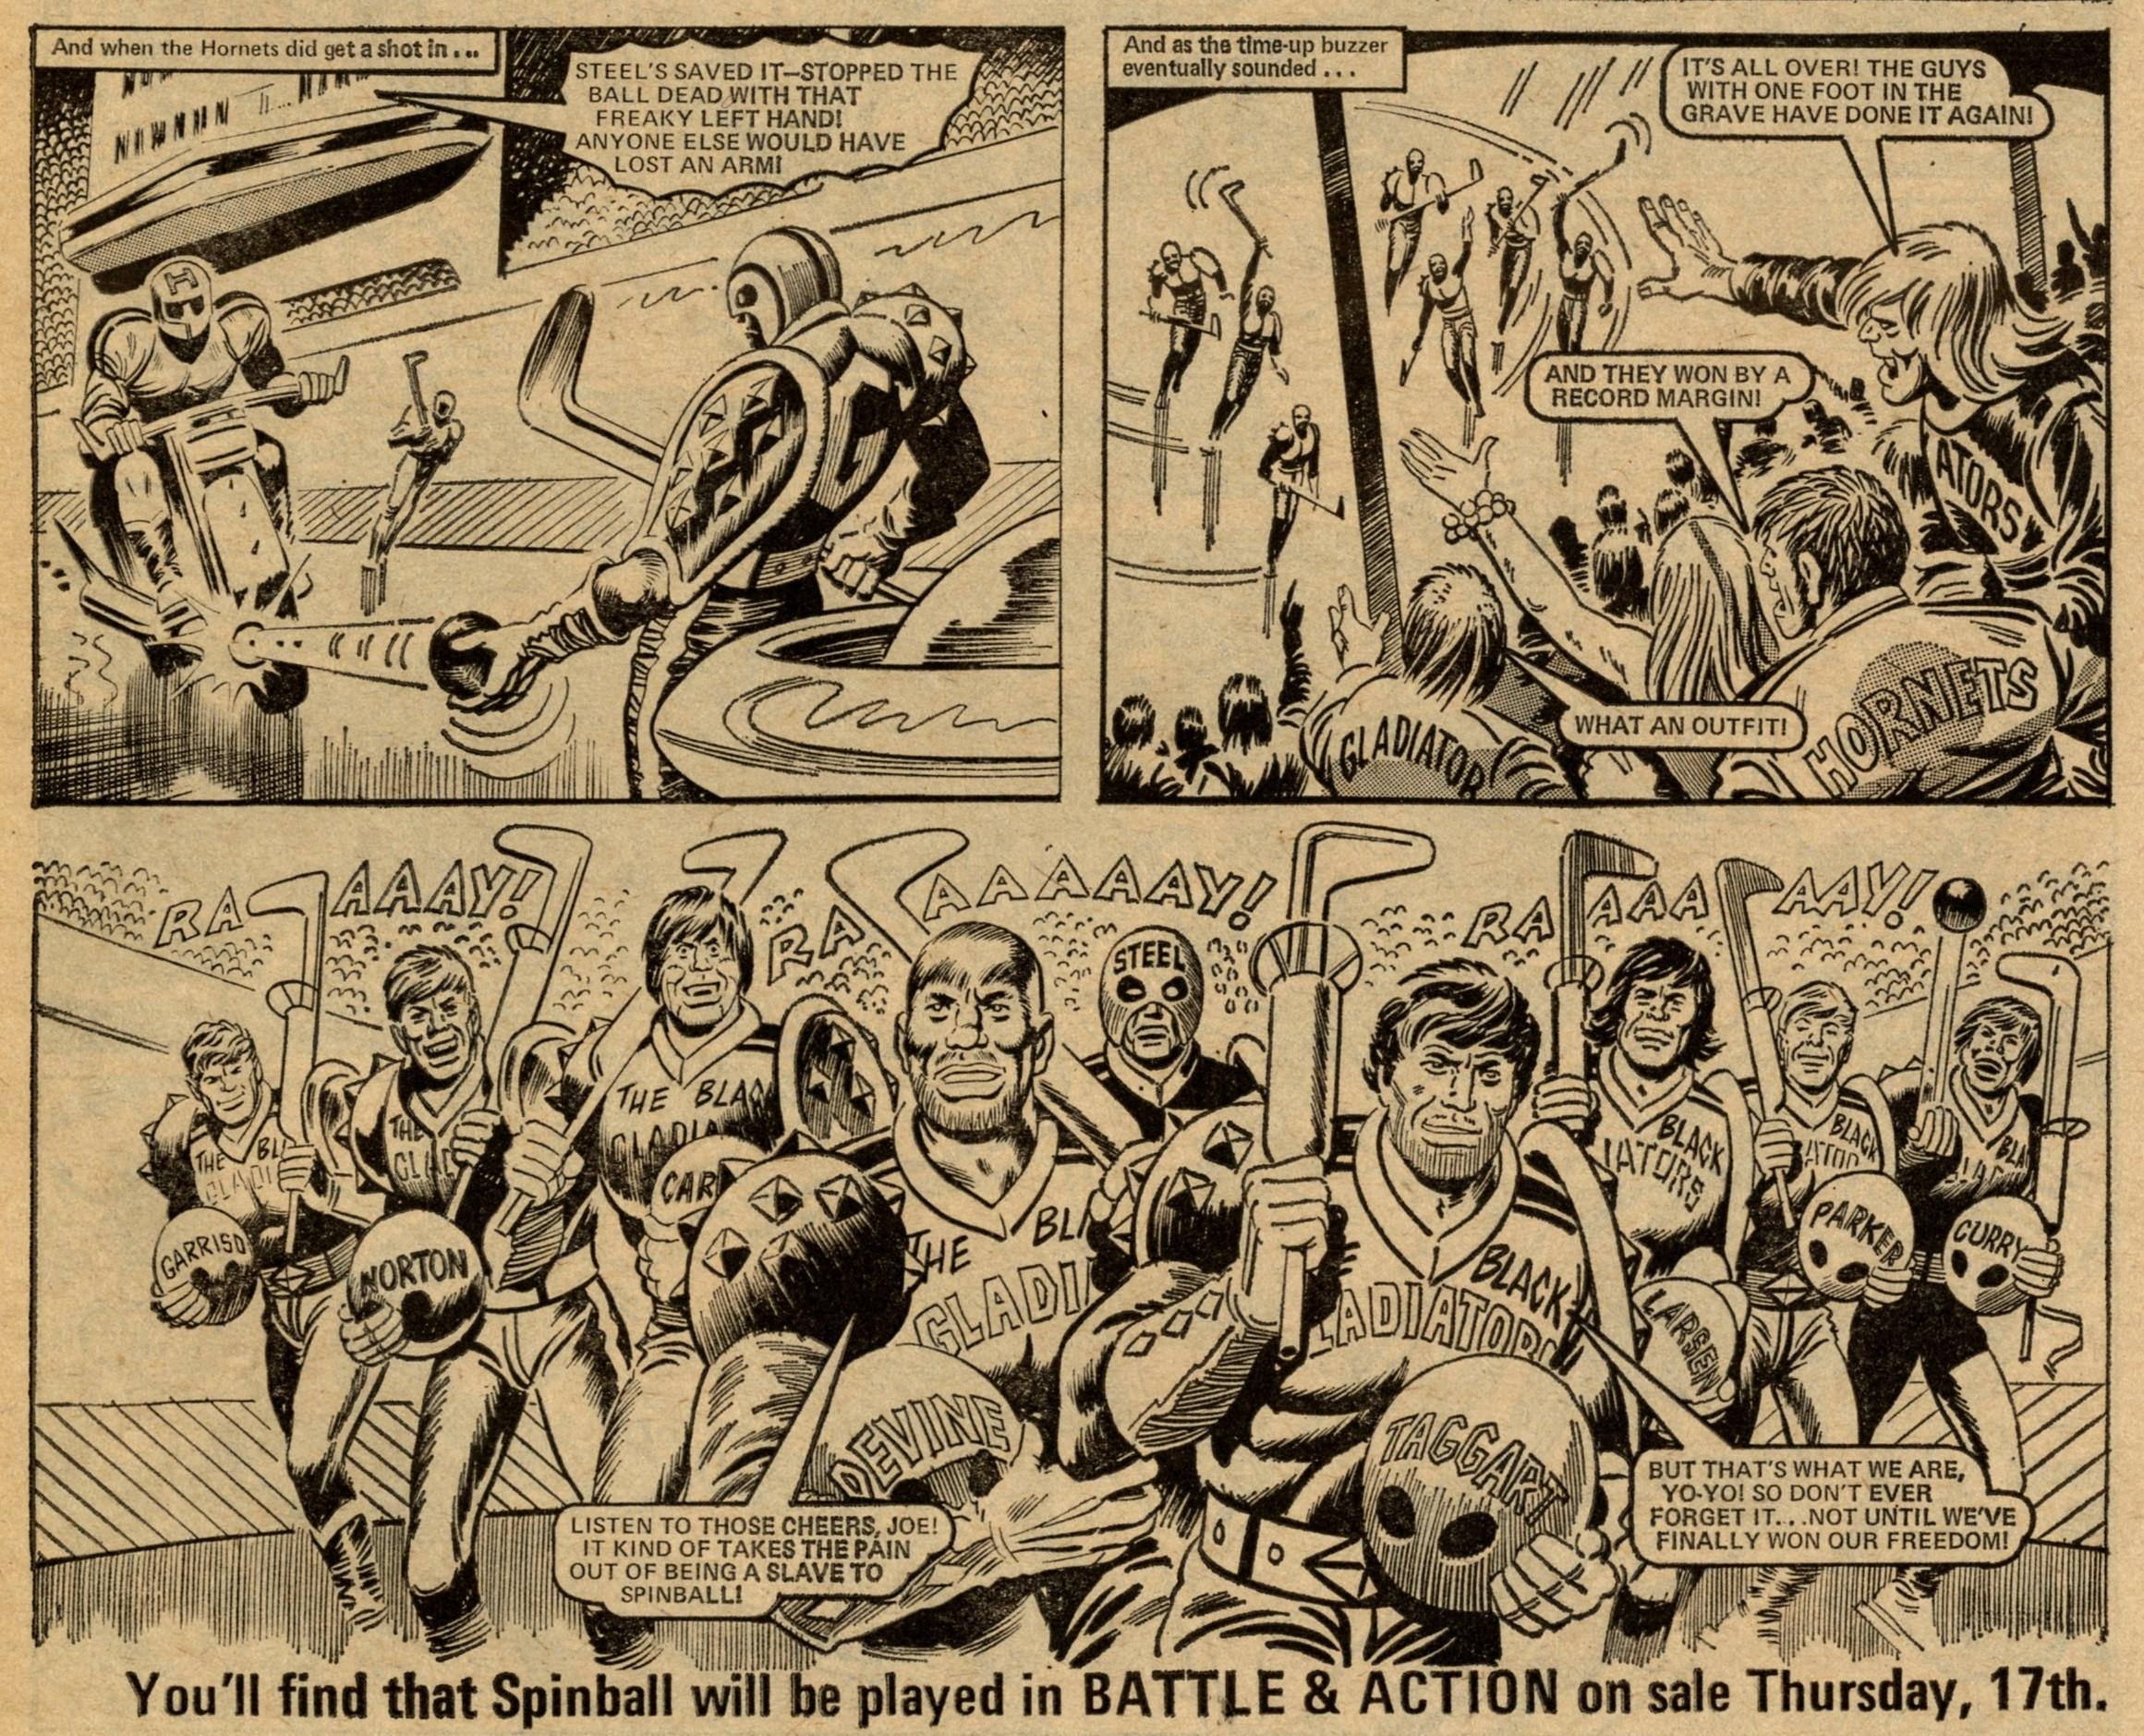 The Spinball Slaves: Tom Tully (writer), Ron Turner (artist)